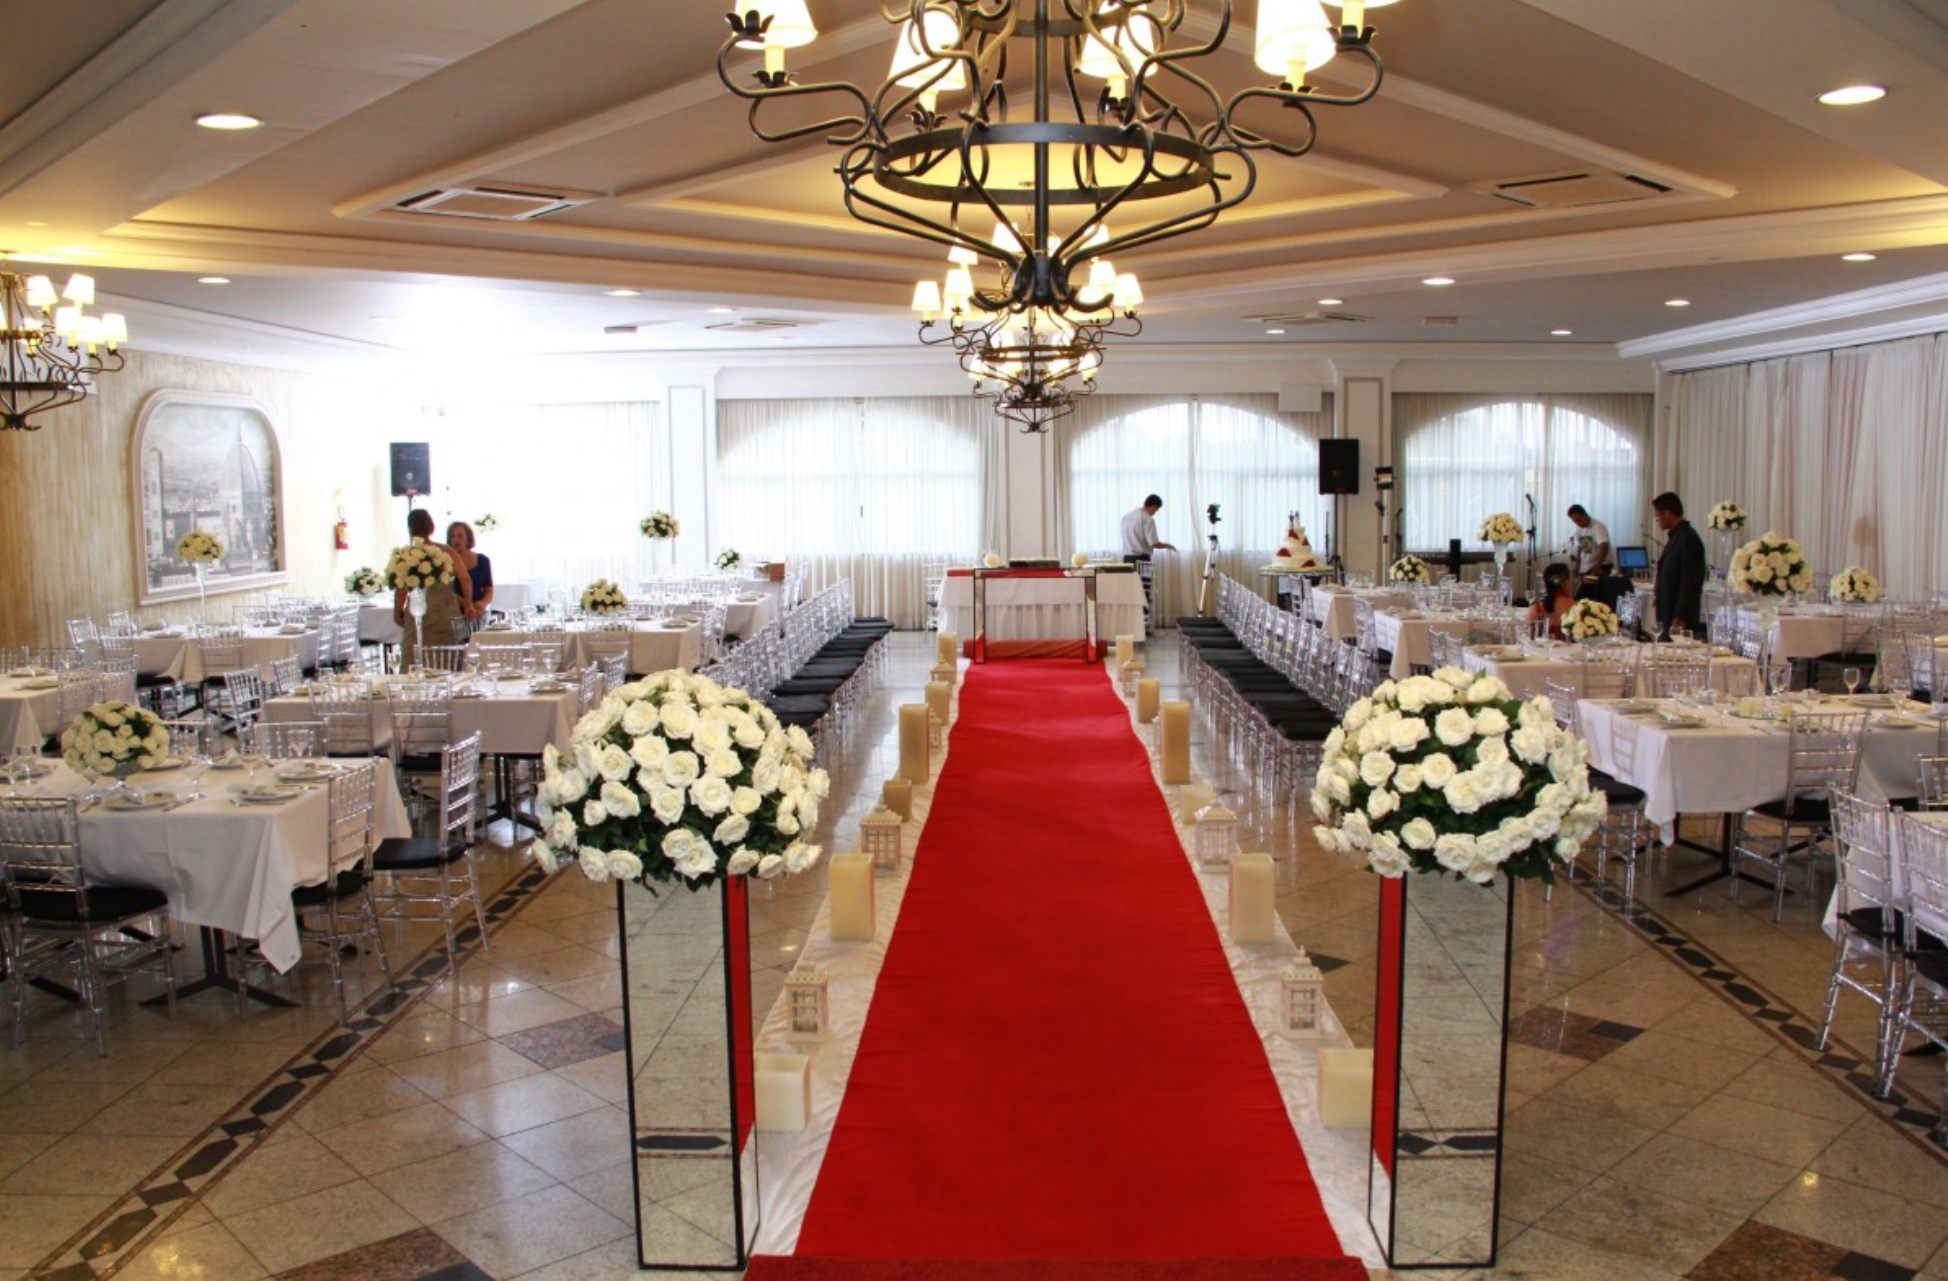 Wedding celebrations return with ferocity, minor changes